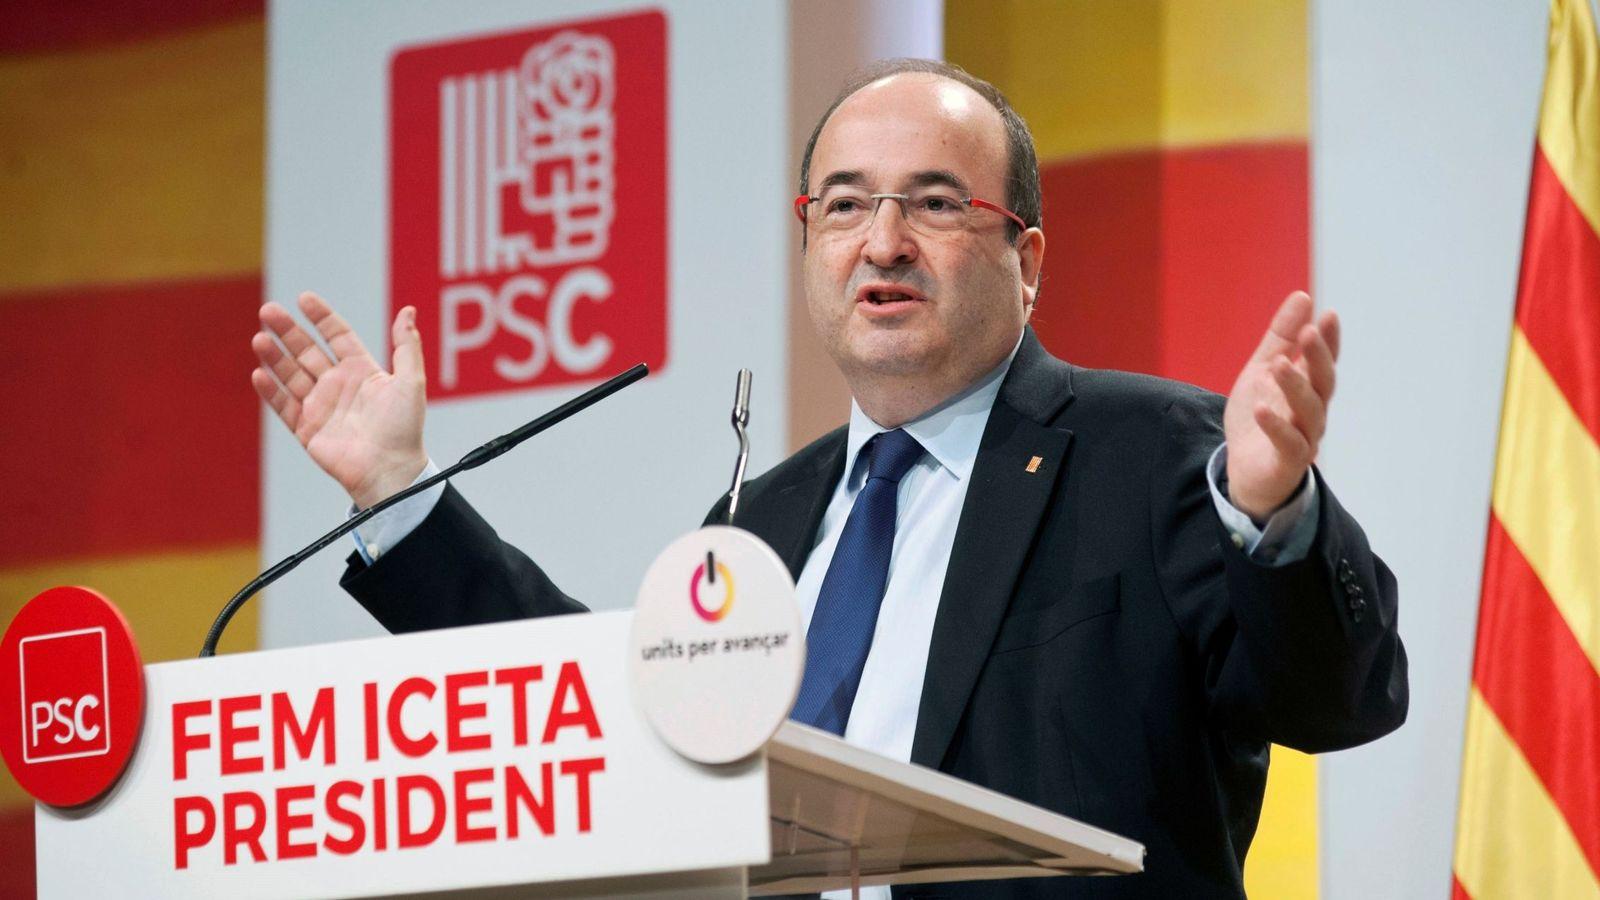 Foto: El candidato del PSC a la presidencia de la Generalitat. (EFE)